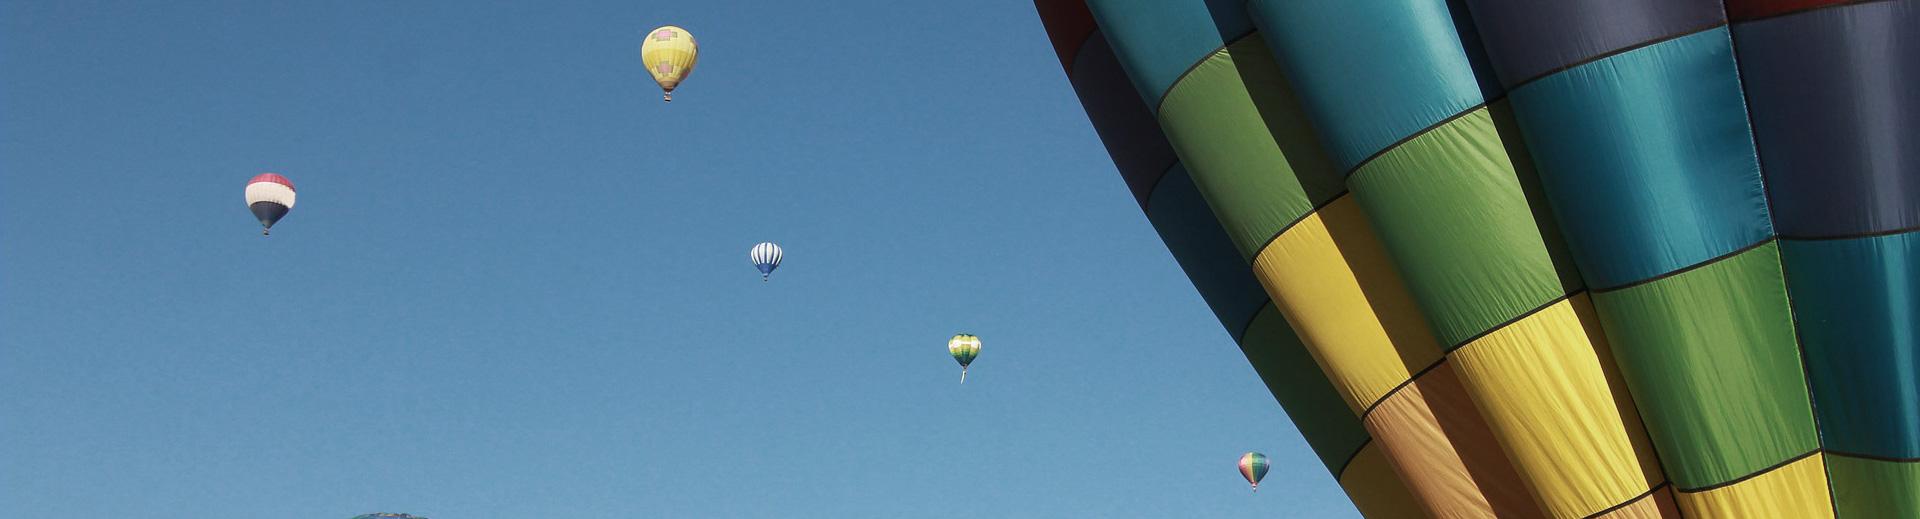 heissluftballon-viele